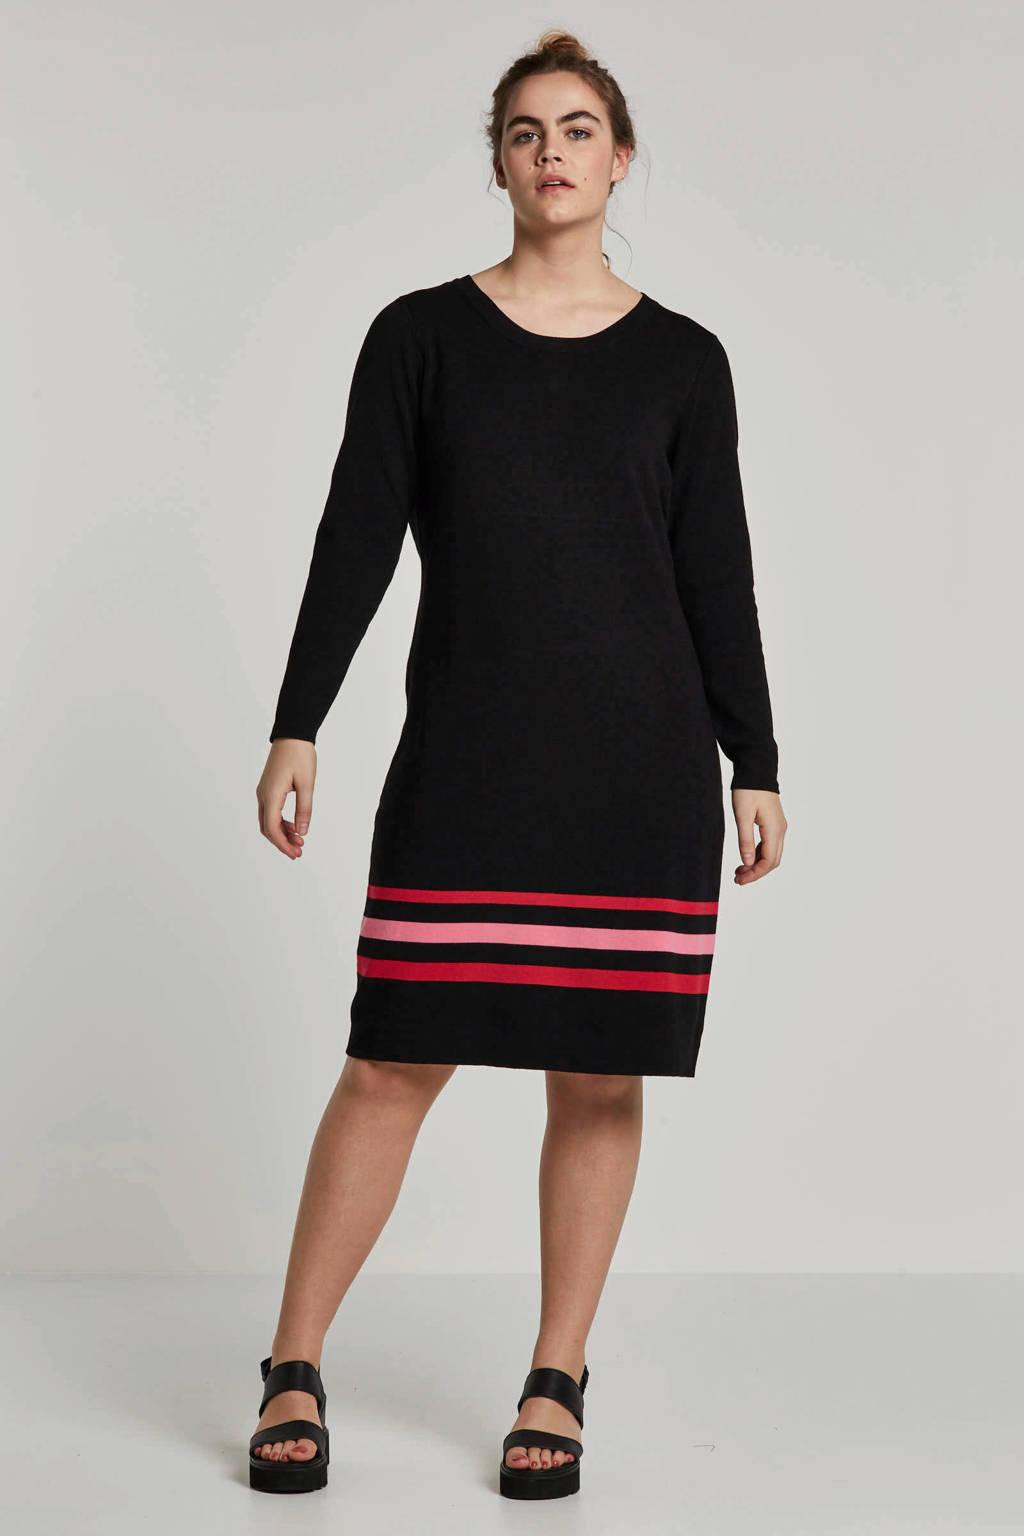 JUNAROSE jurk met strepen, Zwart/roze/rood